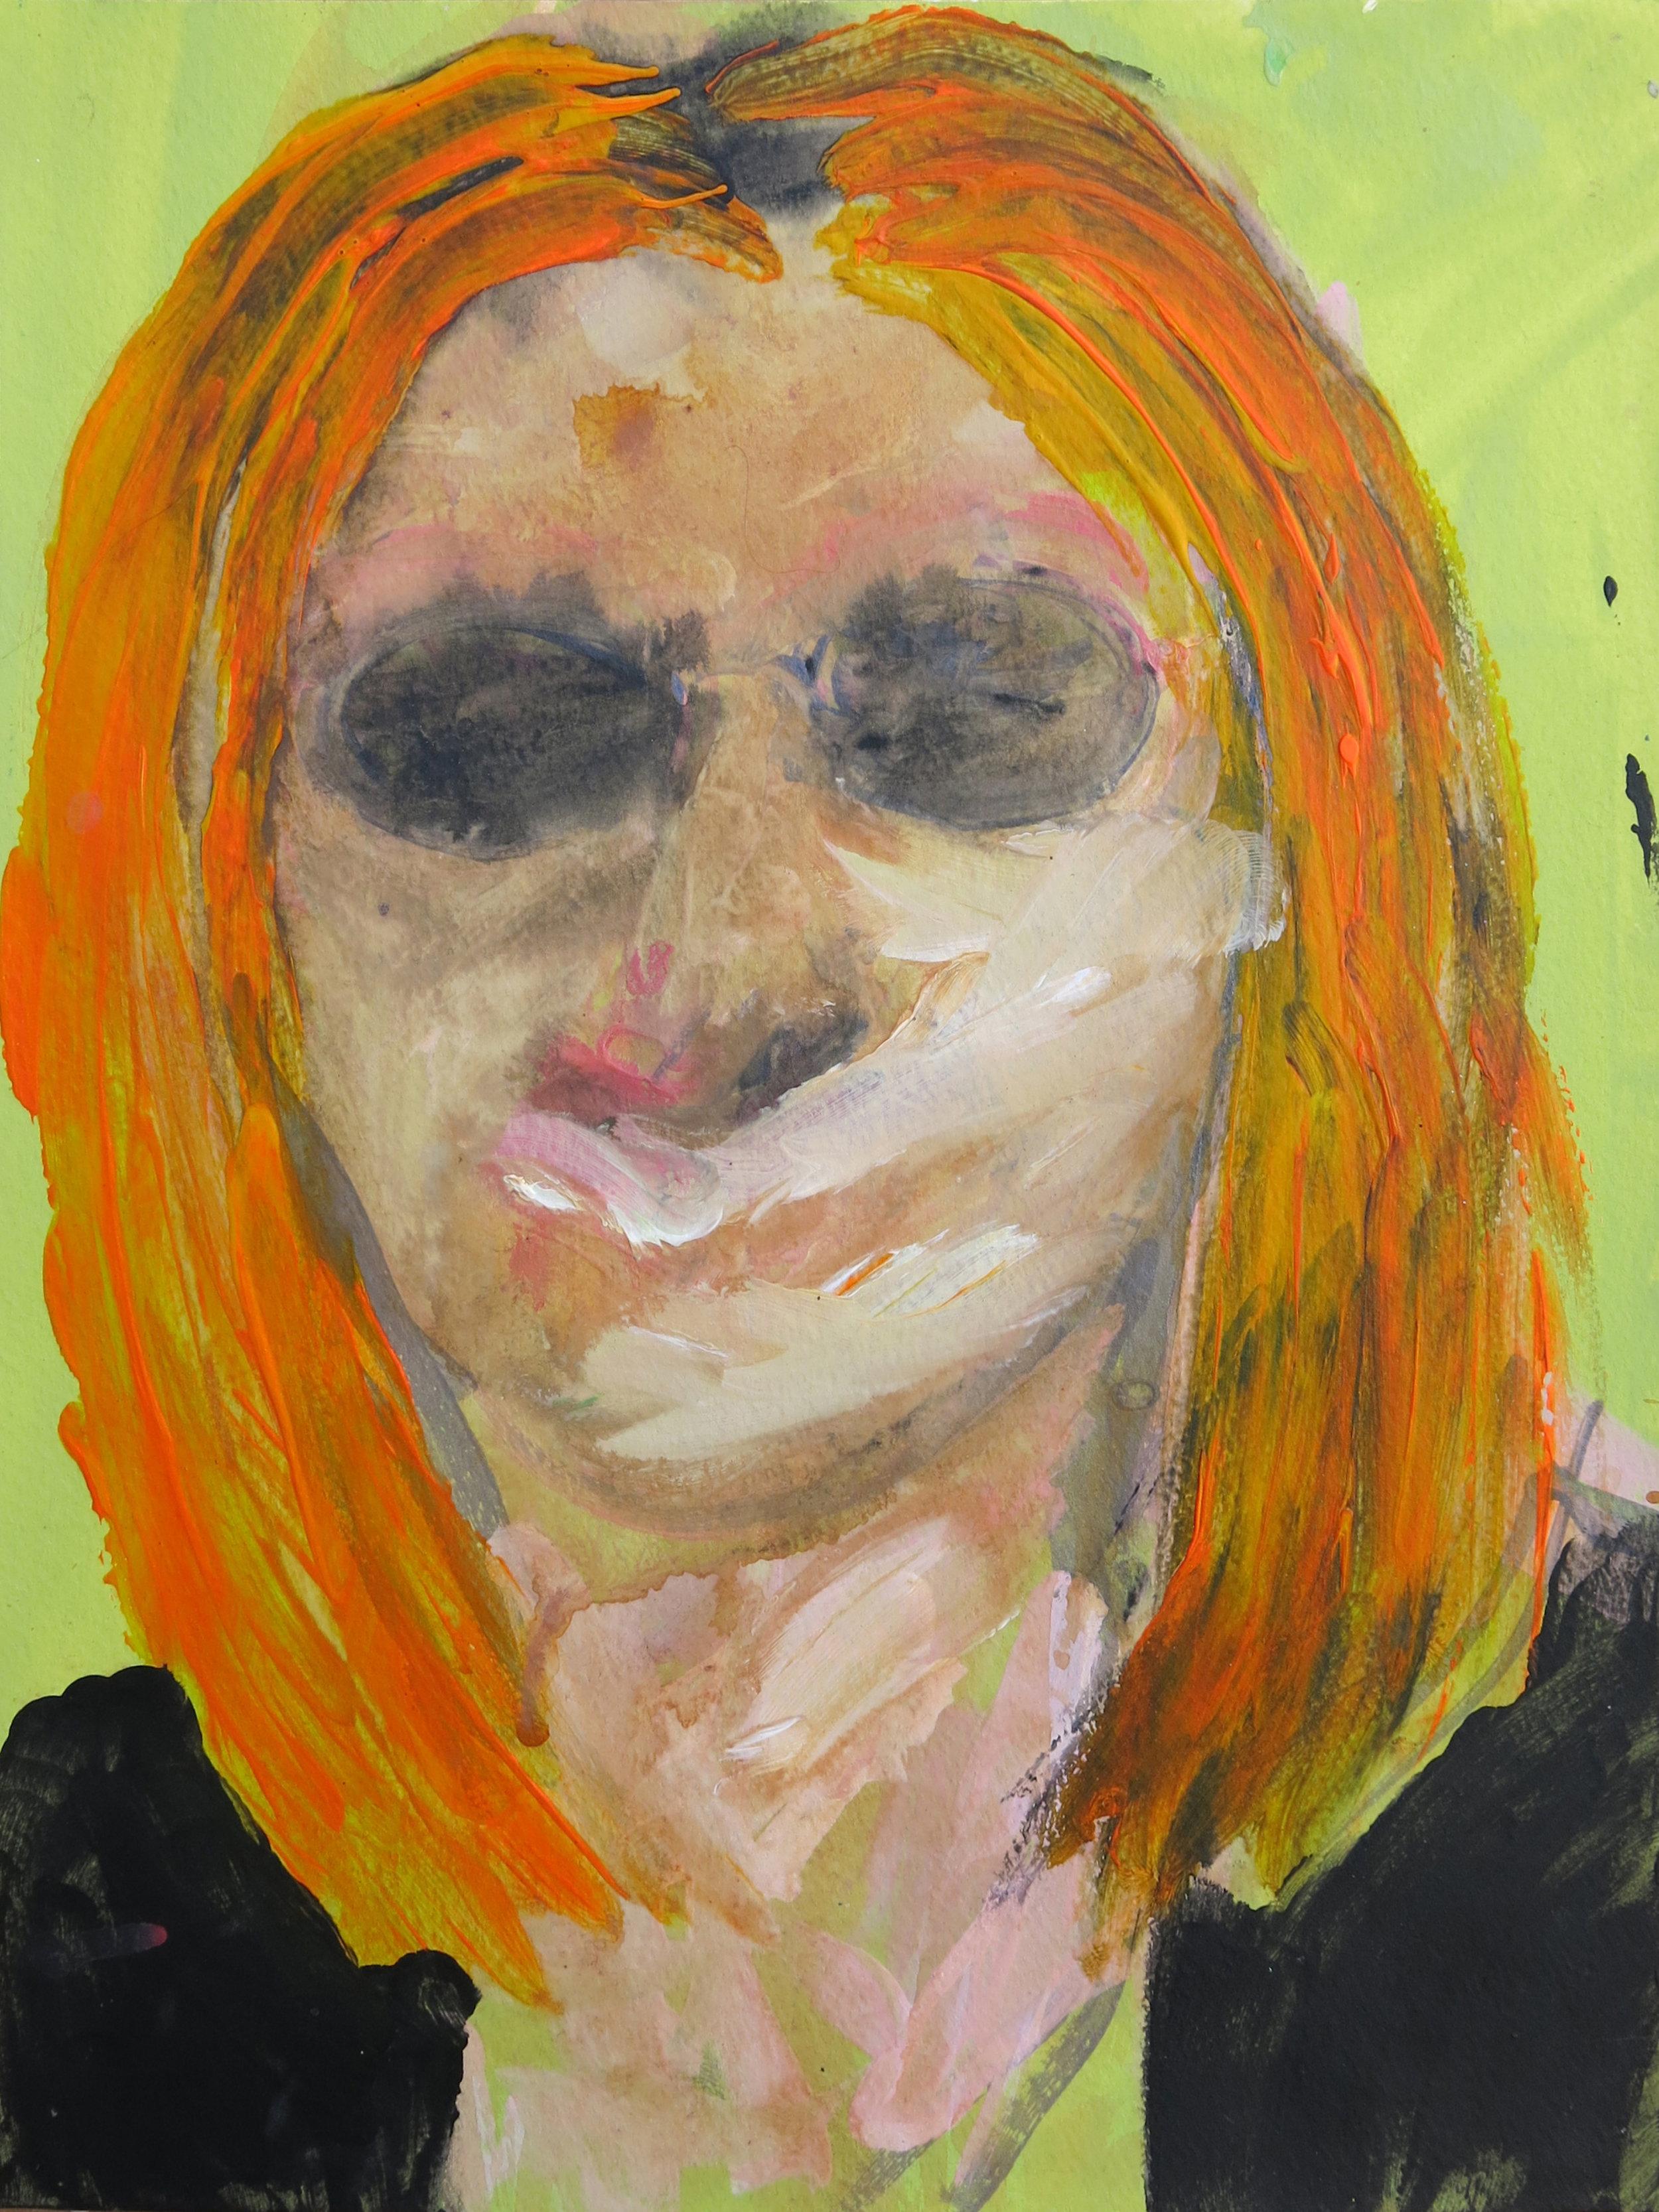 Barbra Streisand Portrait #124